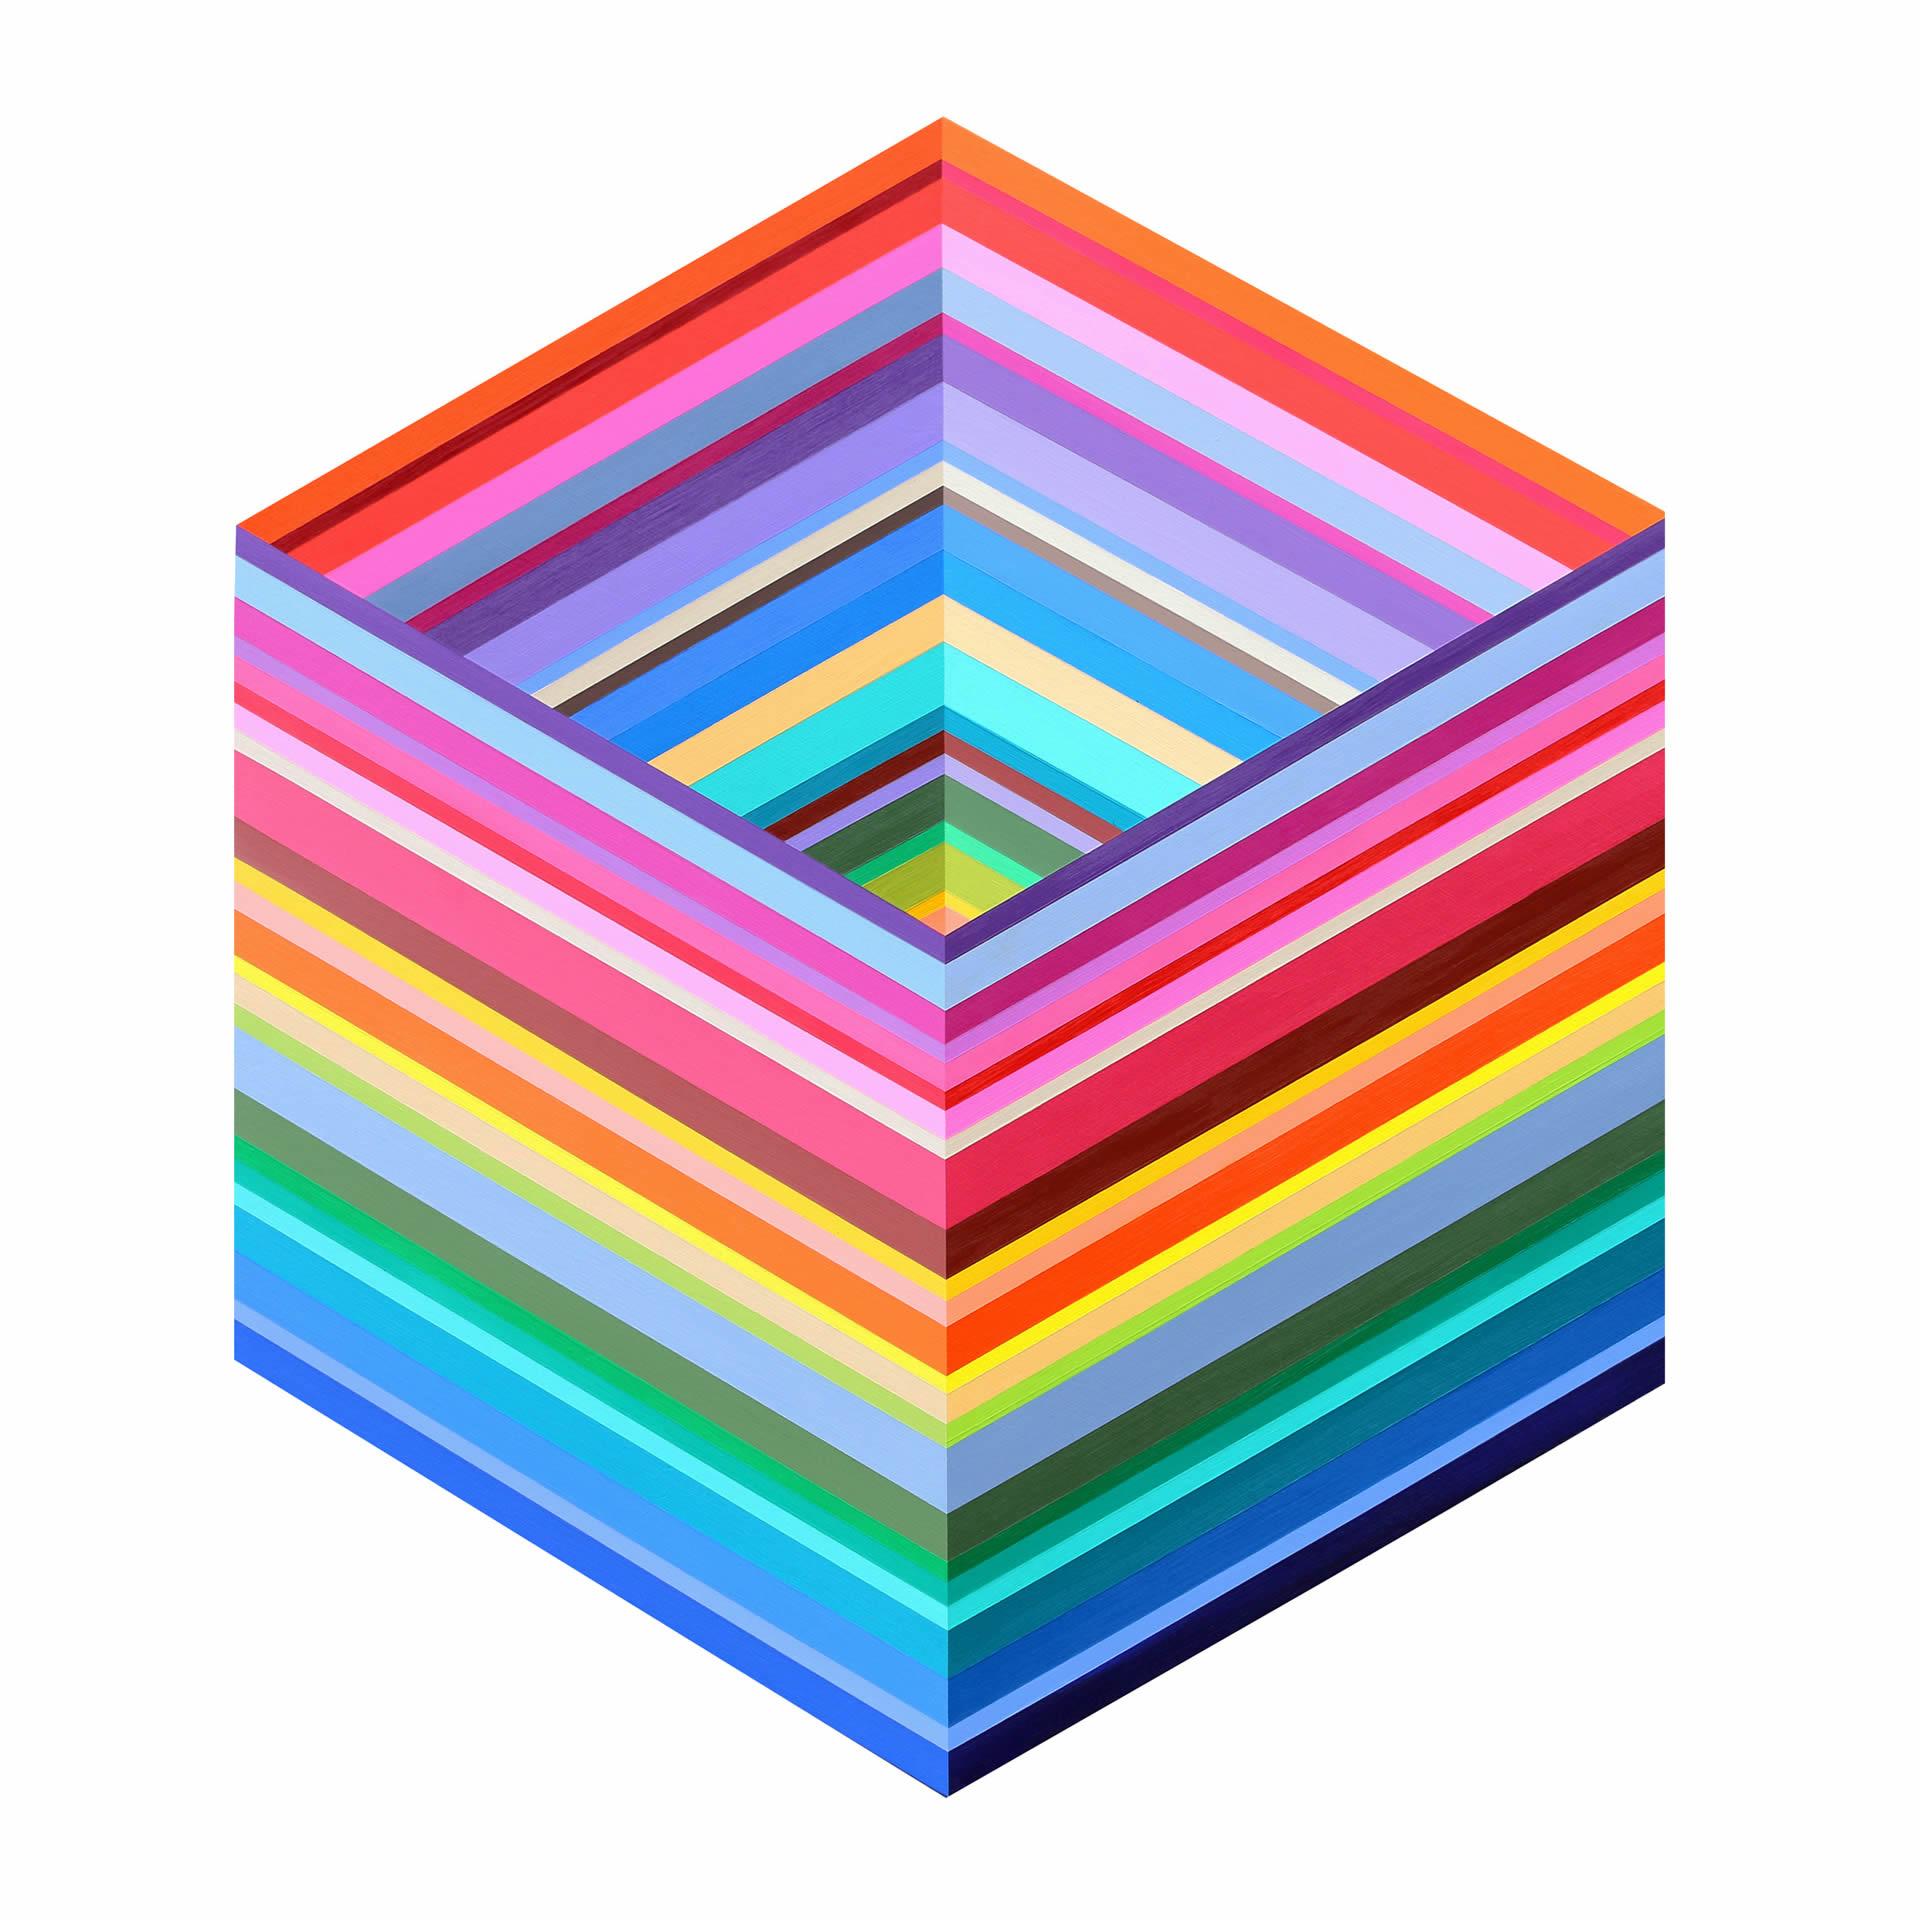 Kristofir-Dean-Electric-Rays-of-Spring-40x35-Online-Art-Galleries